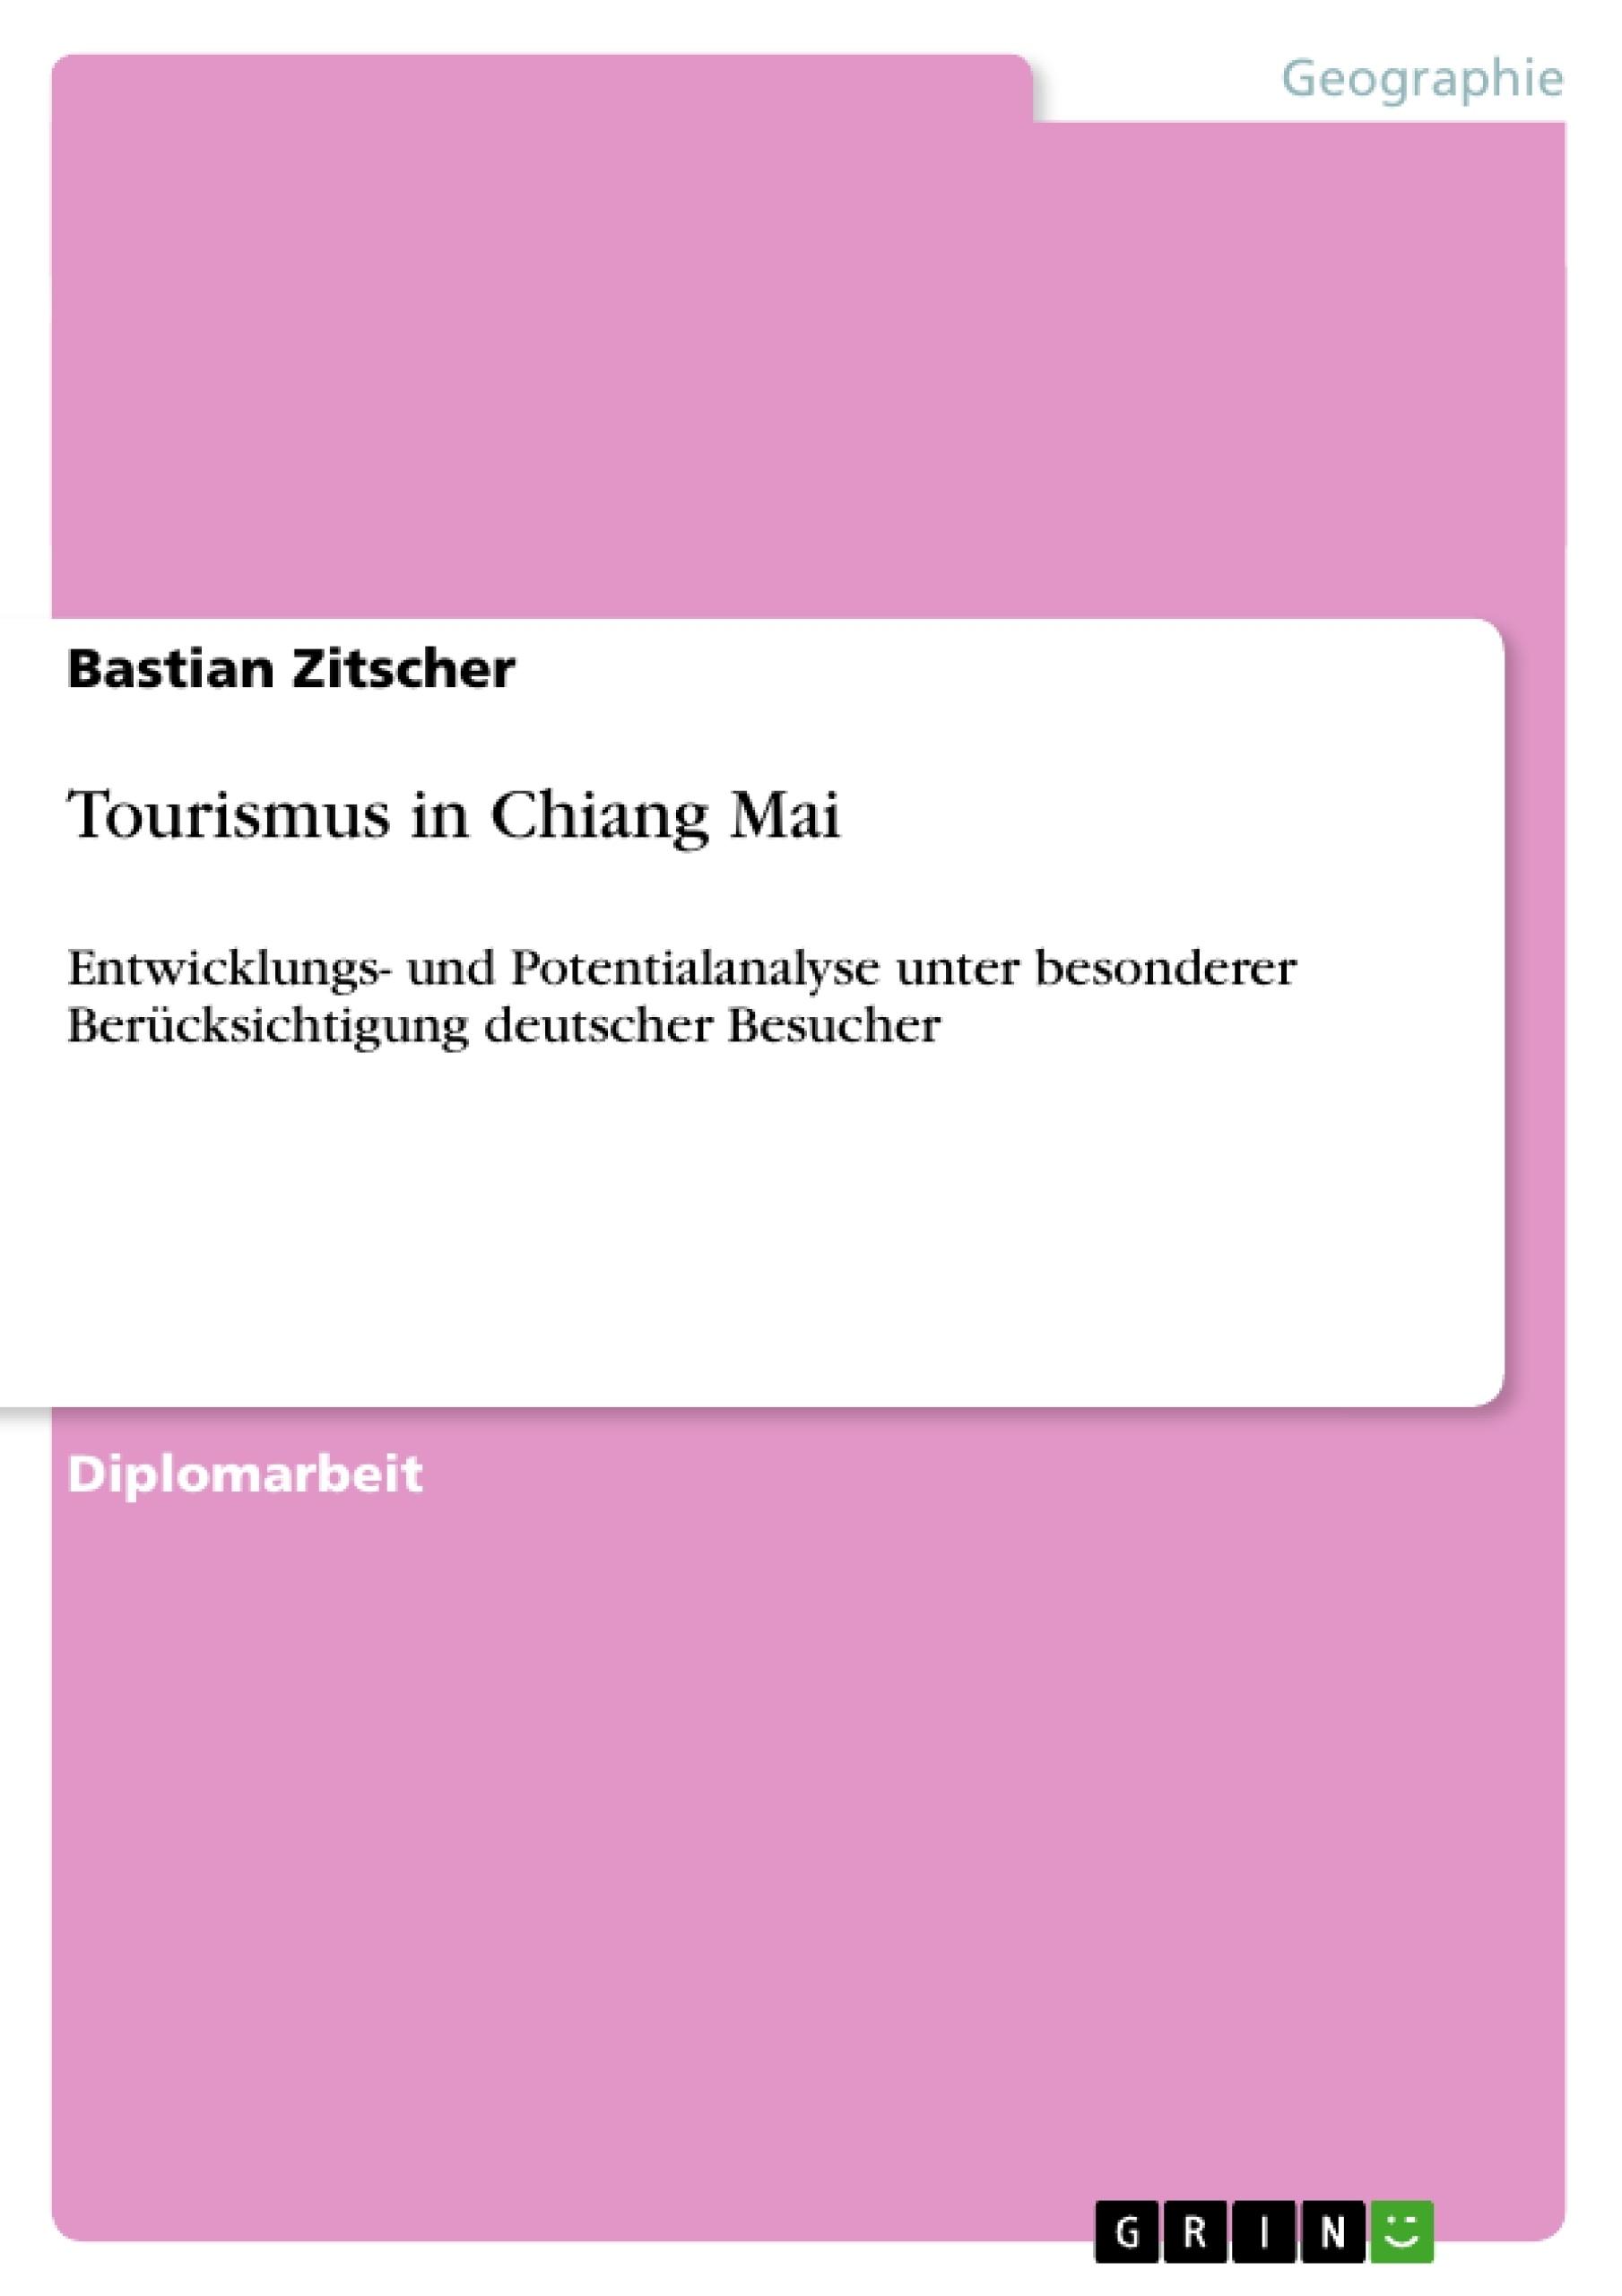 Titel: Tourismus in Chiang Mai